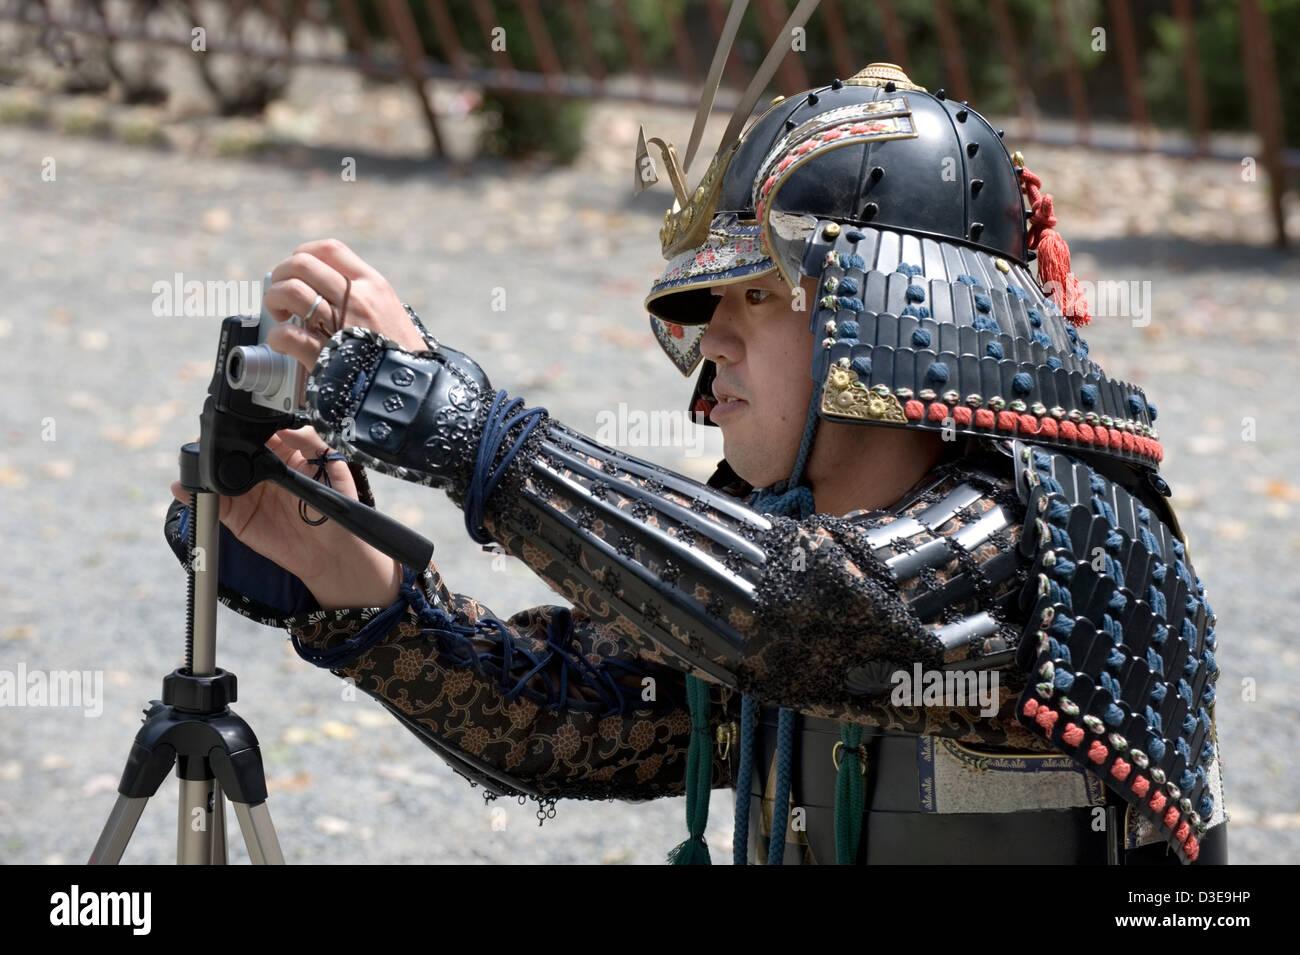 A young Sunday samurai sets up his camera for a commemorative shot during a festival at Odawara Castle in Kanagawa - Stock Image